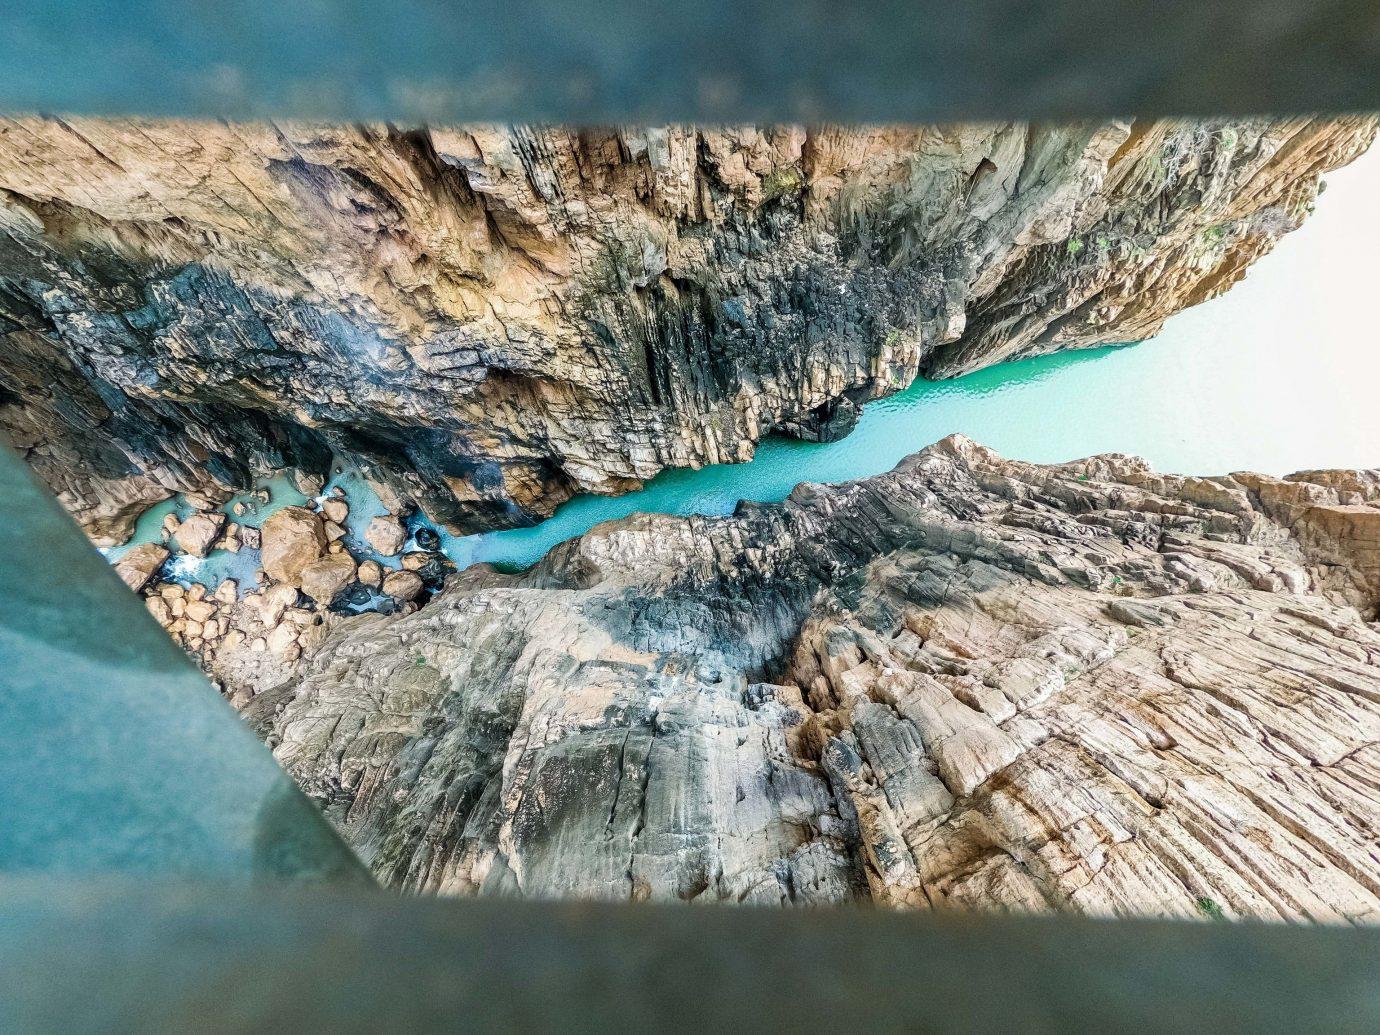 europe Outdoors + Adventure Trip Ideas rock Sea cliff formation water terrain geology Coast escarpment outcrop sky fault bedrock klippe